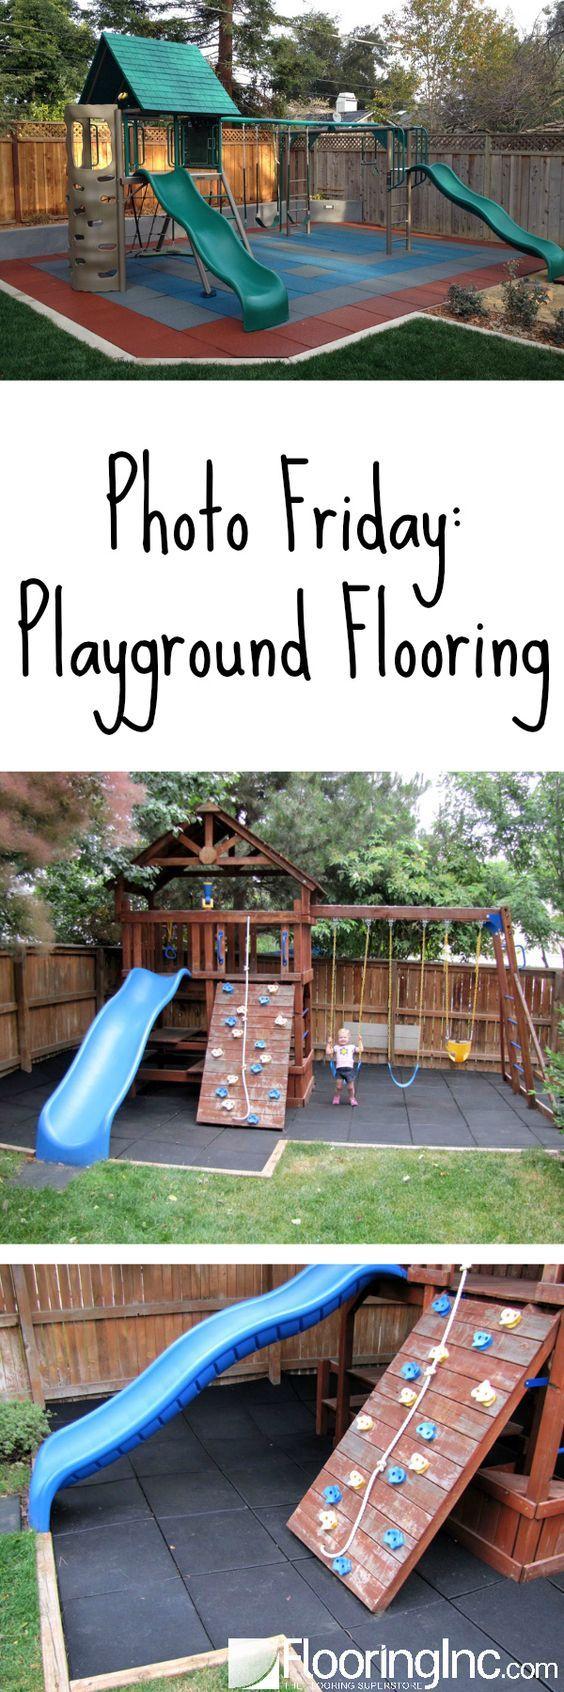 Best 25+ Kids slide ideas on Pinterest   Sliding room doors, Slide slide  and Top pallet ideas